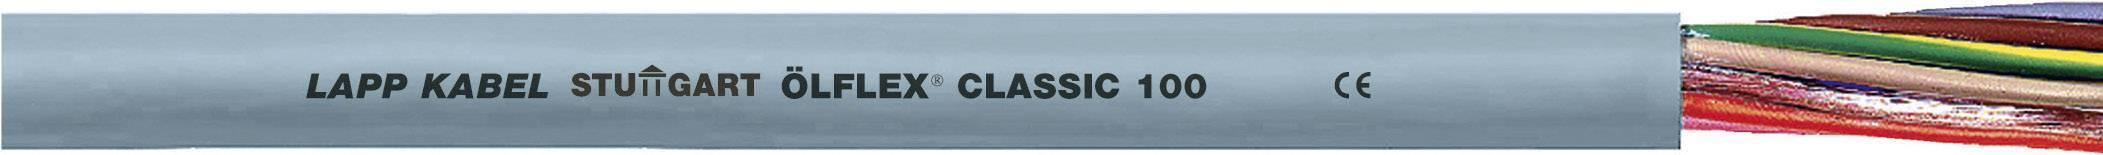 Kabel LappKabel Ölflex CLASSIC 100 4G25 (00101153), PVC, 25,4 mm, 750 V, šedá, 500 m